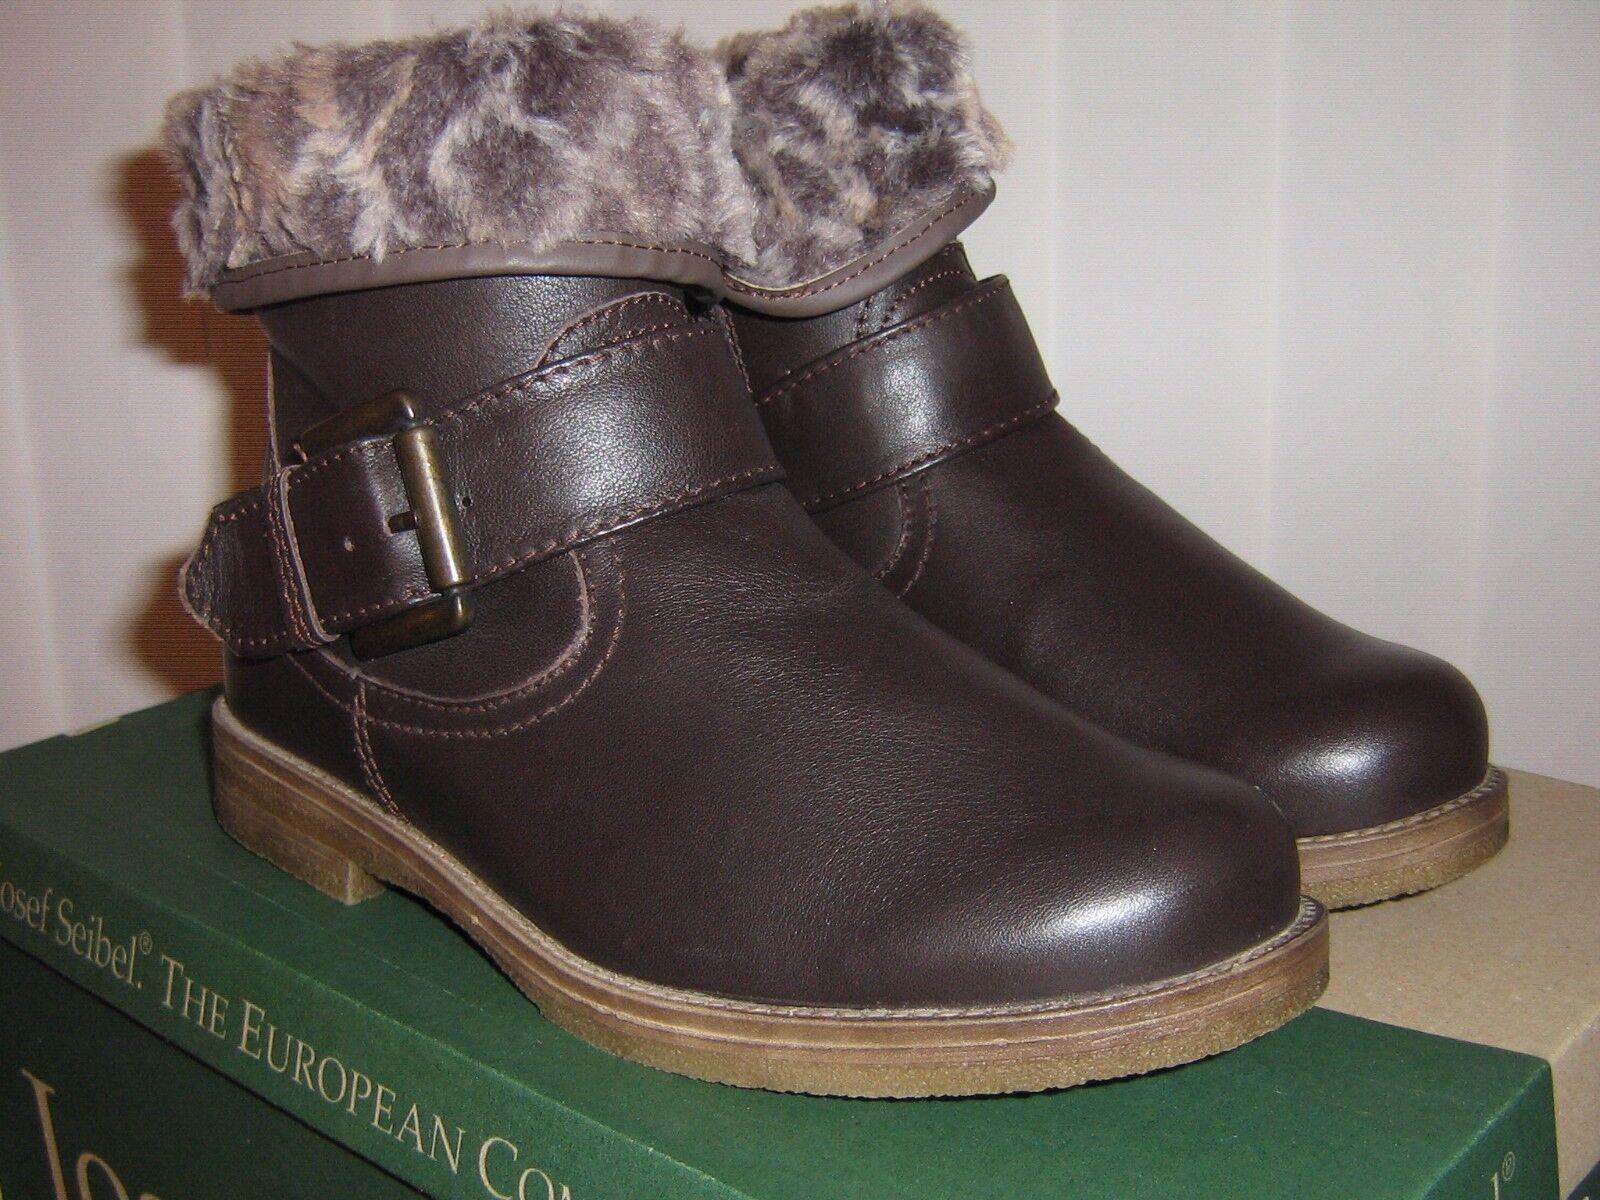 Josef Seibel Tamara 04 braun Leather Two Way Zip Up Ankle Stiefel Warm Lining